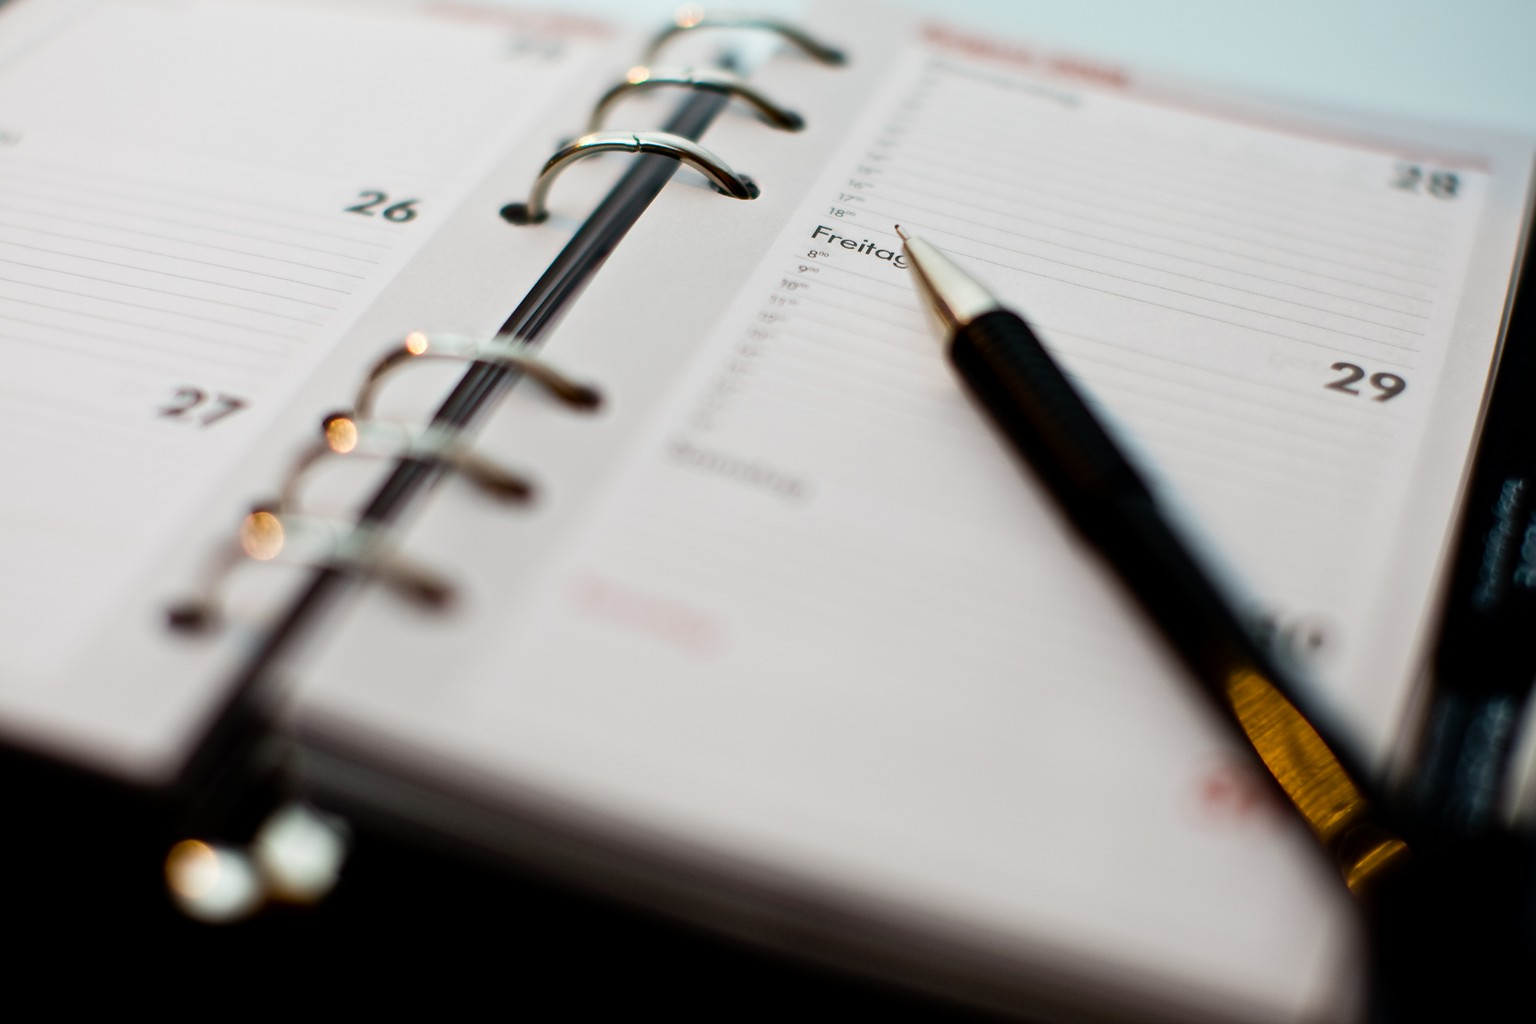 Agenda stylo